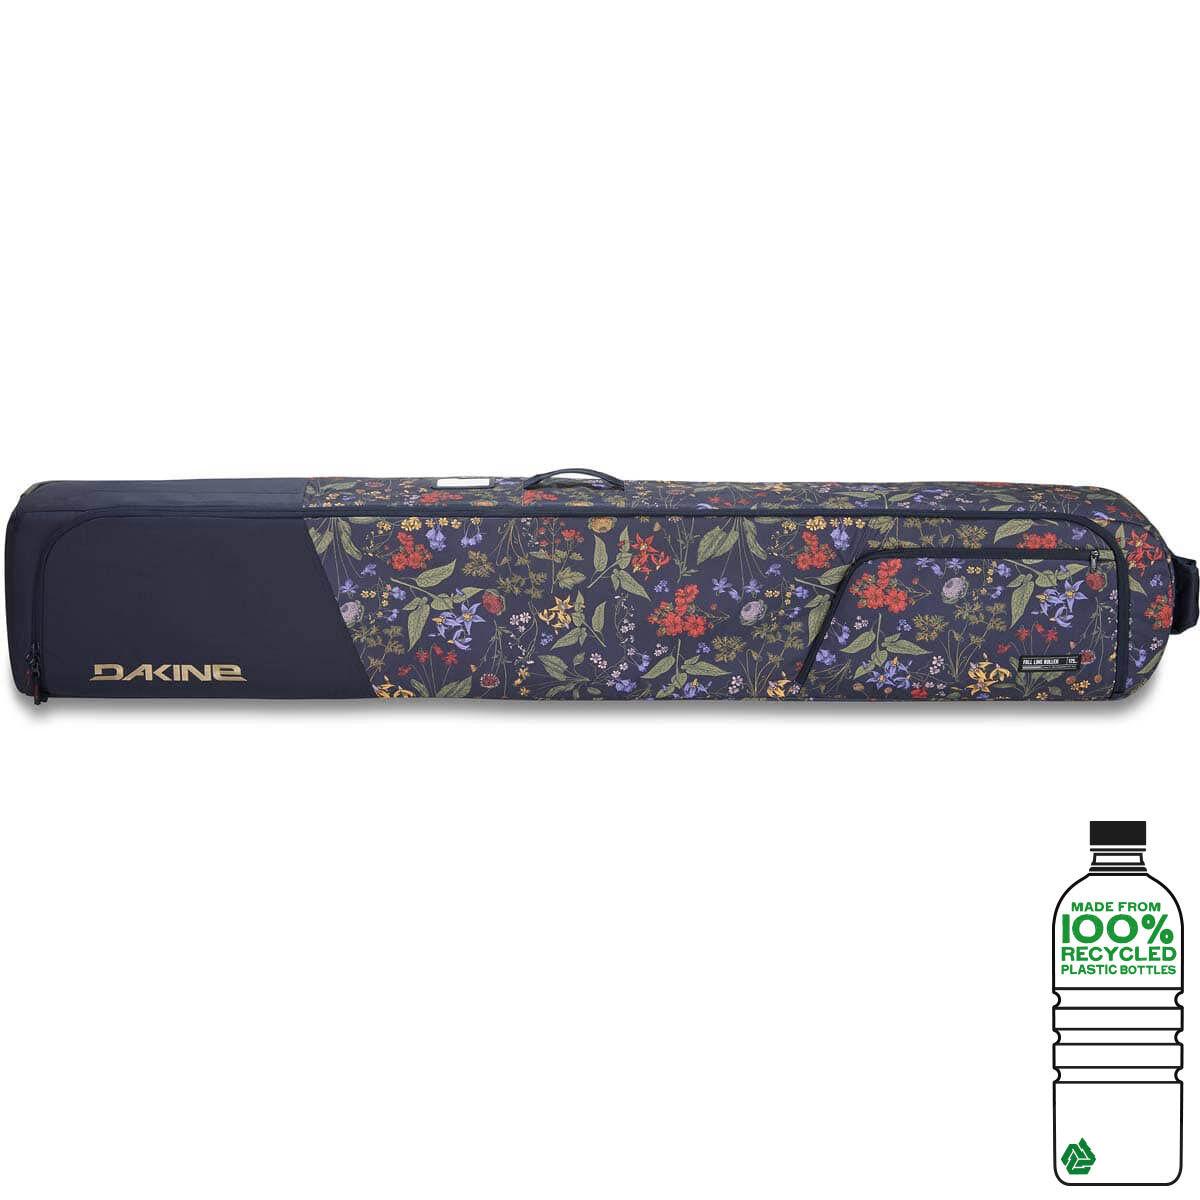 Dakine Fall Line Ski Roller Bag 190 cm Sci Borsa Botanics Pet